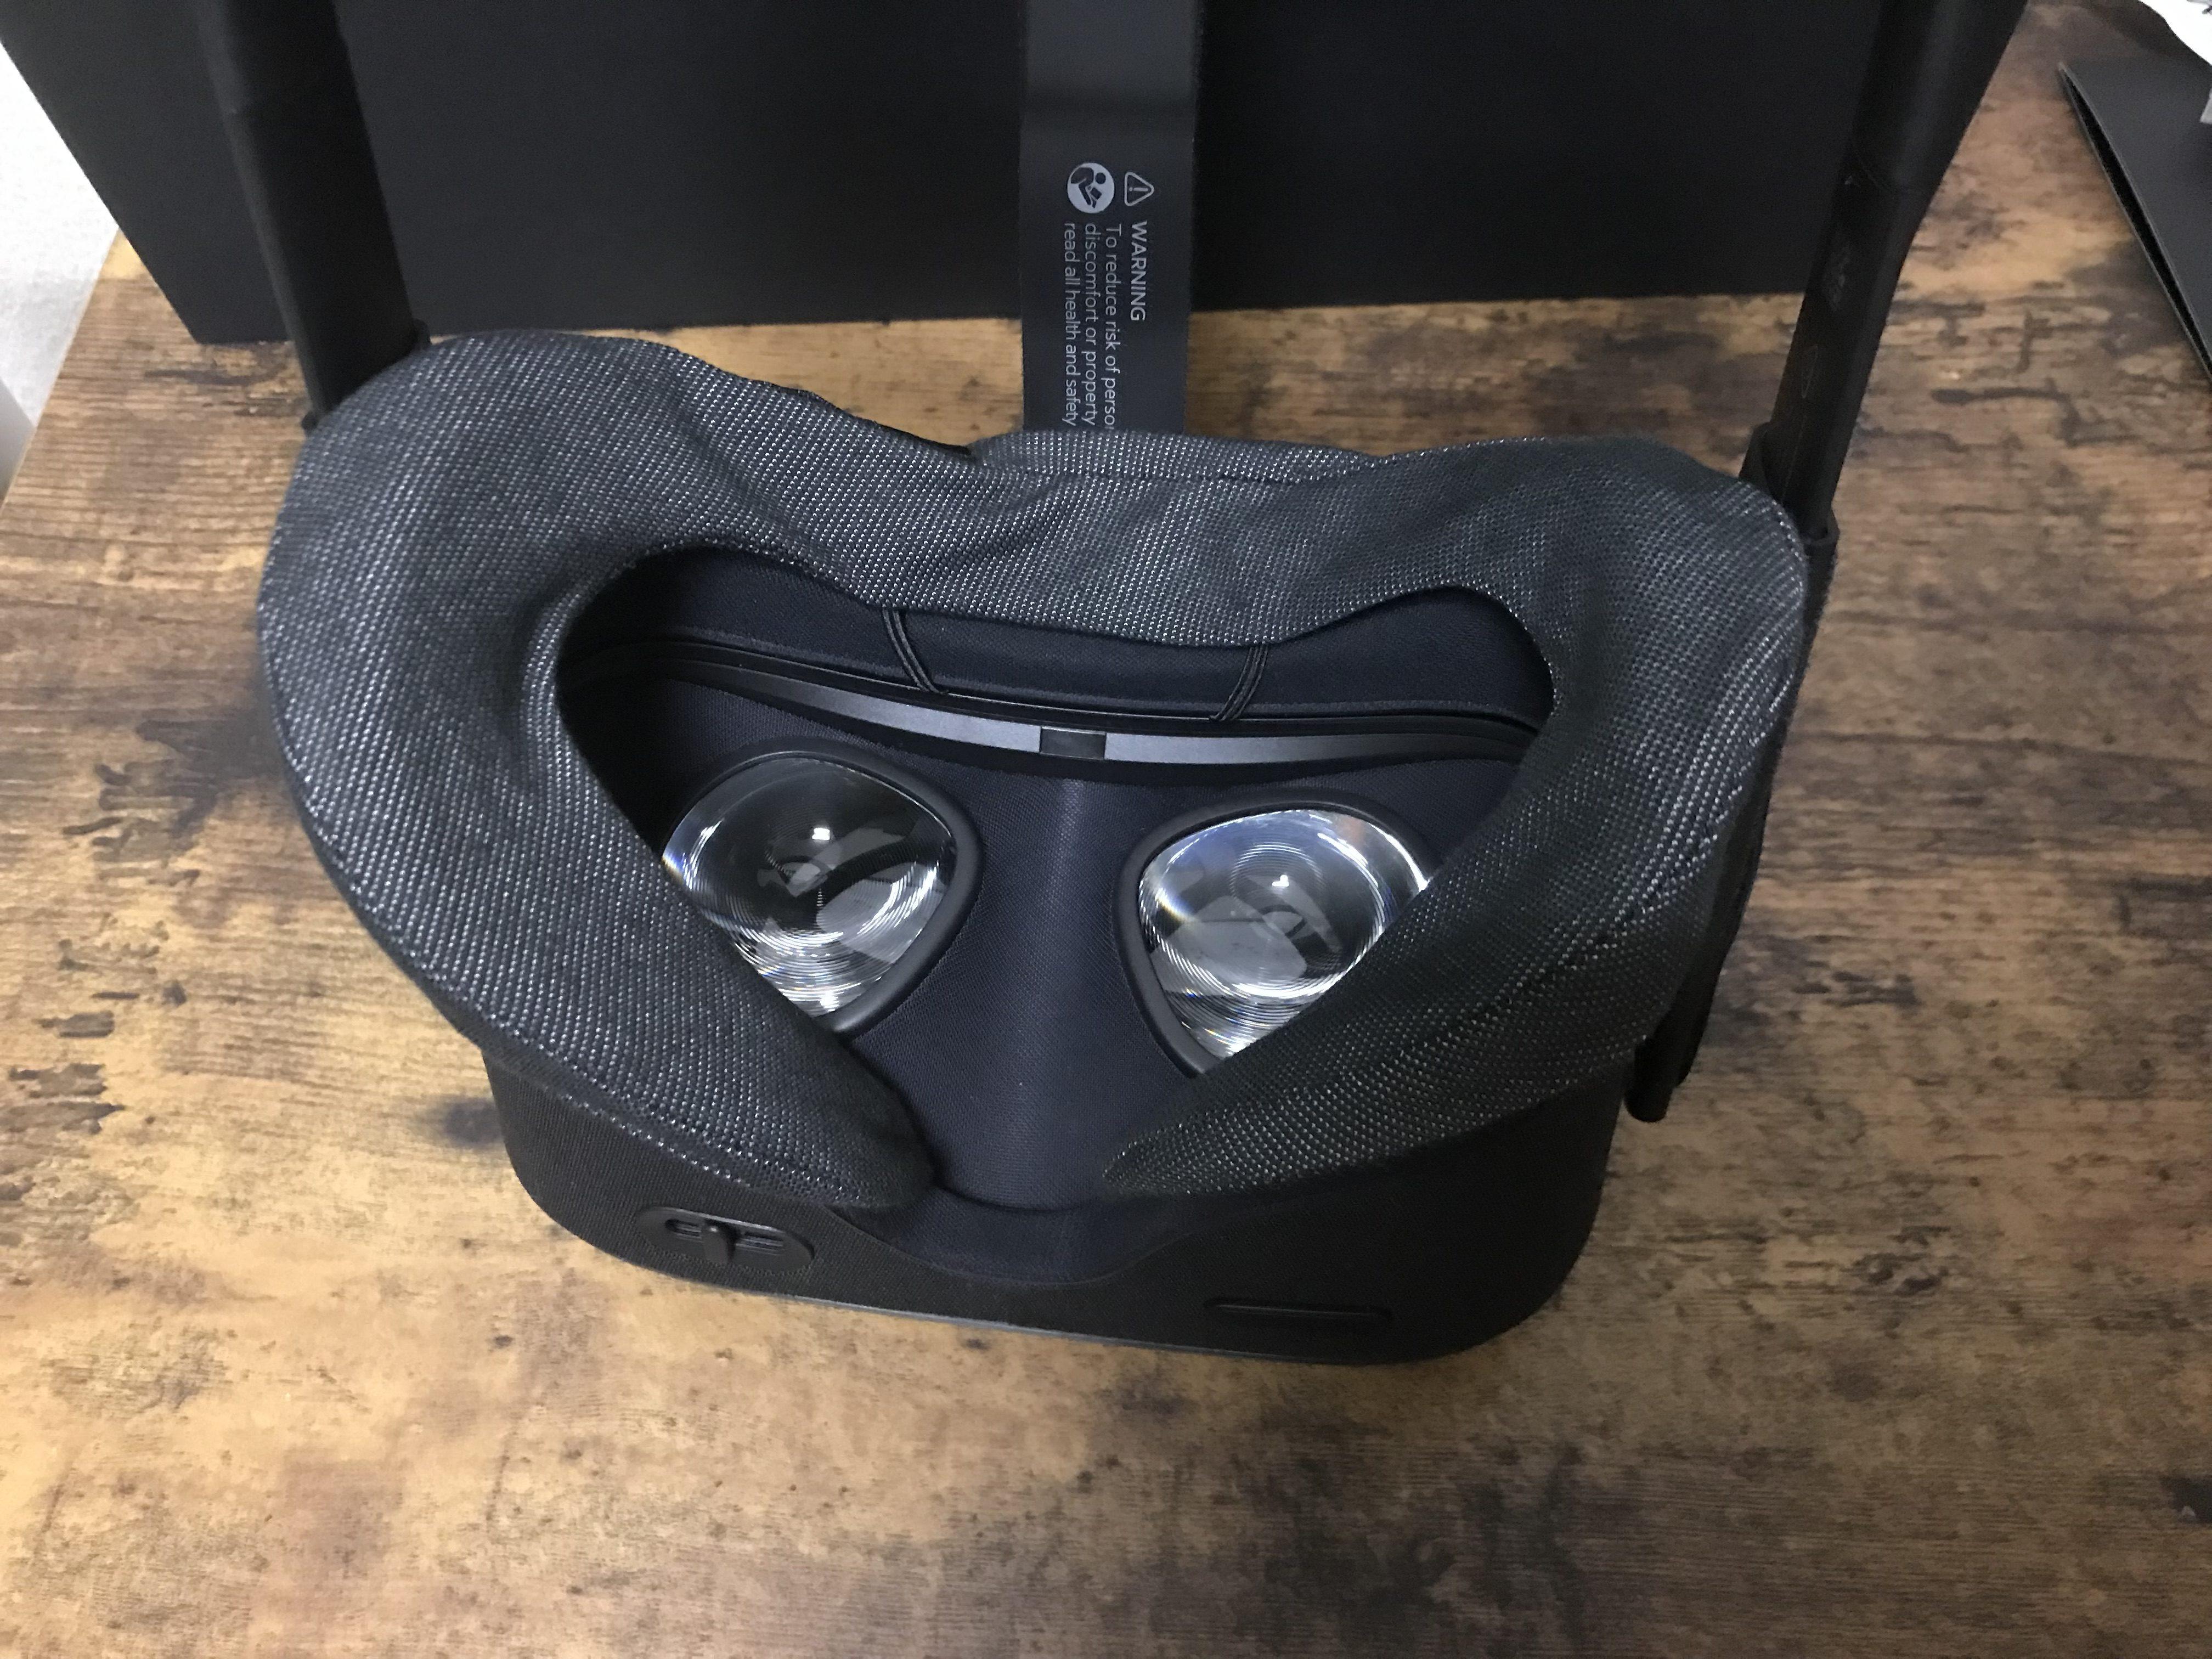 Oculus Questの面白いアクションゲームソフト教えます!!